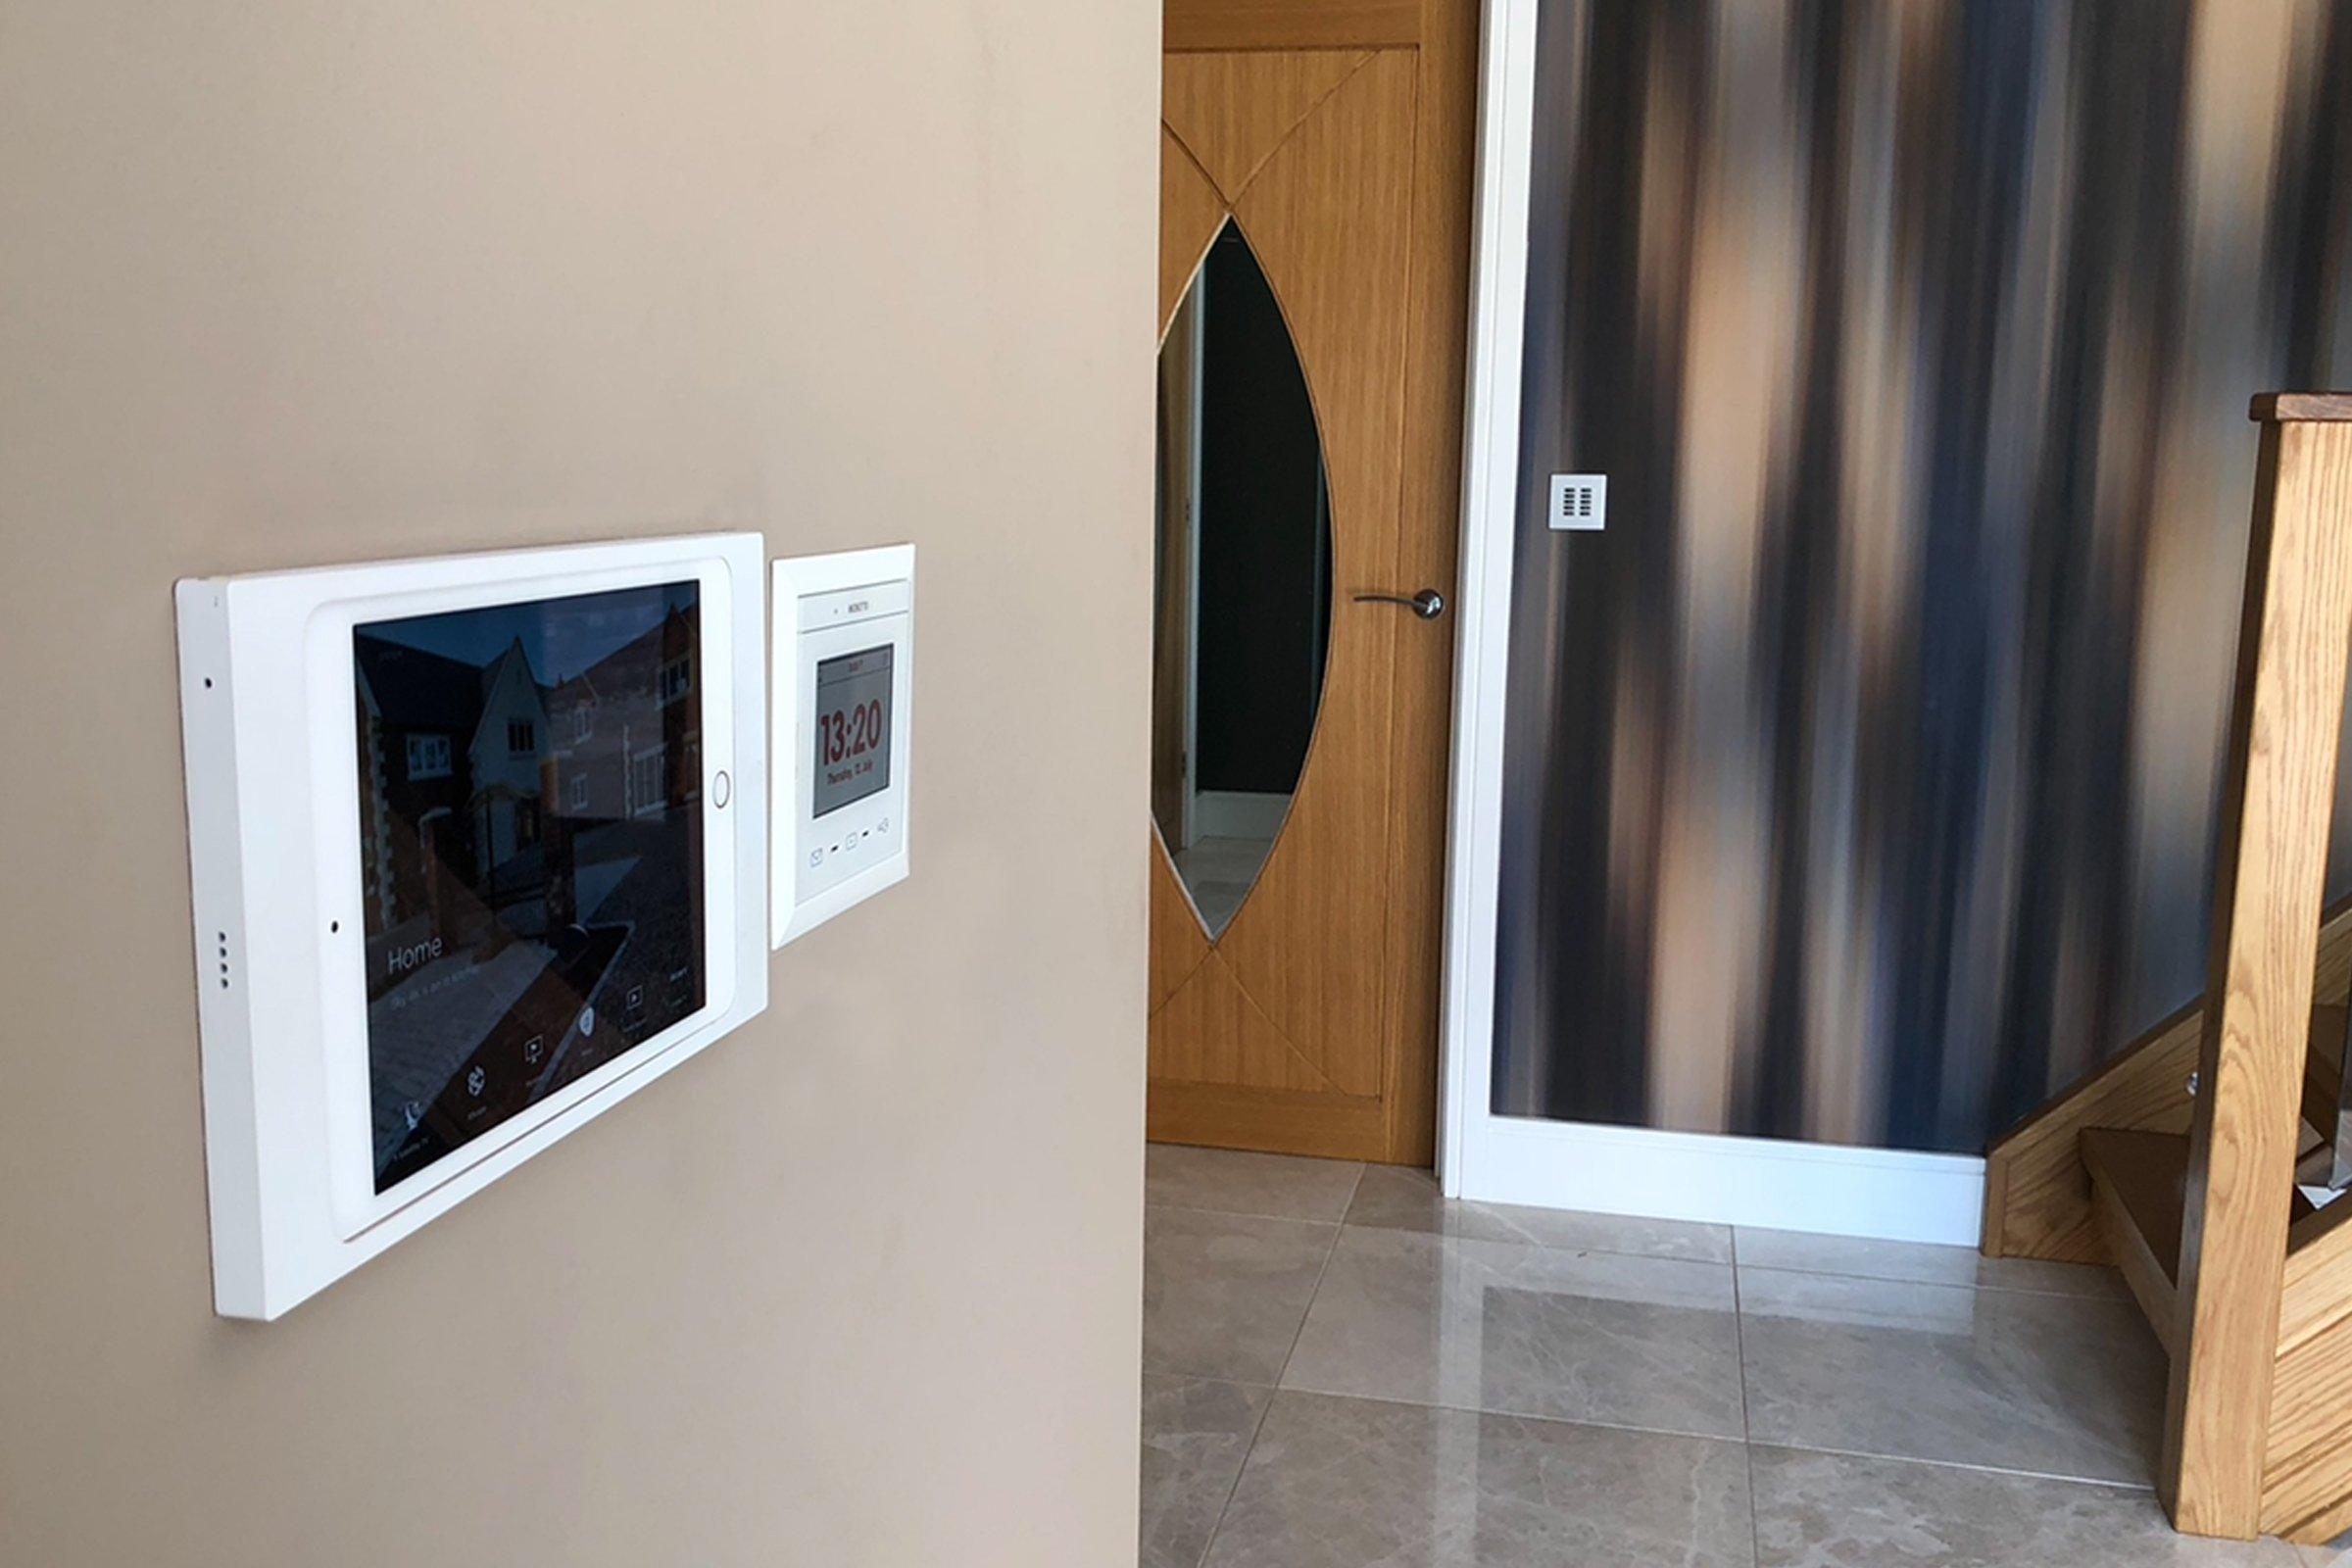 Savant automation system with Rako lighting control